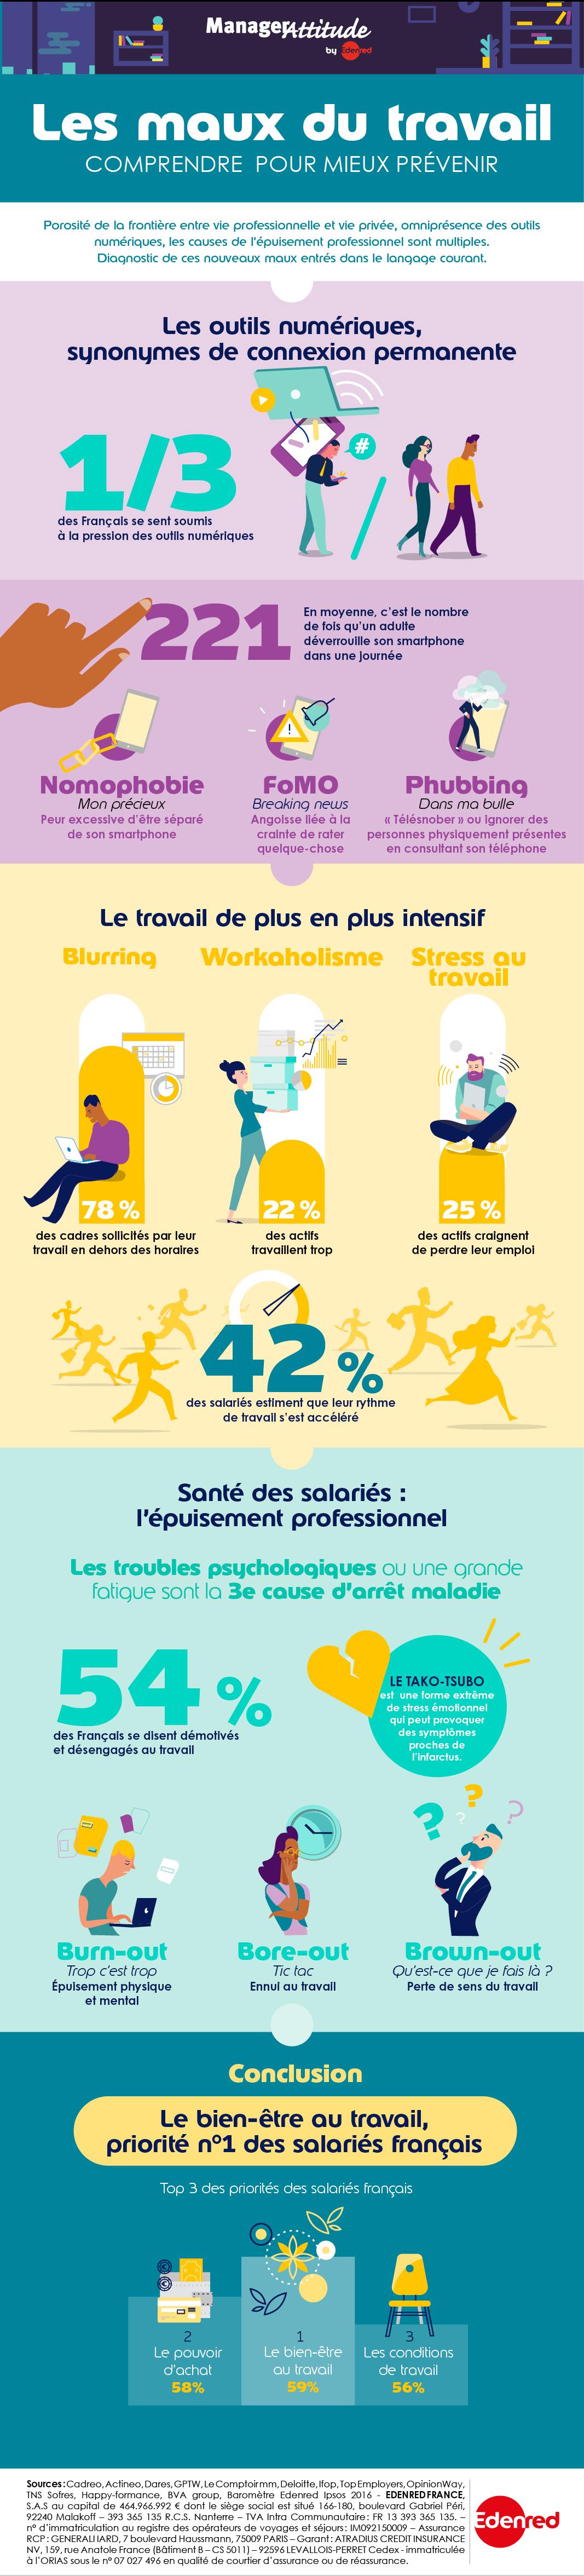 infographie-edenred-prevenir-maux-au-travail